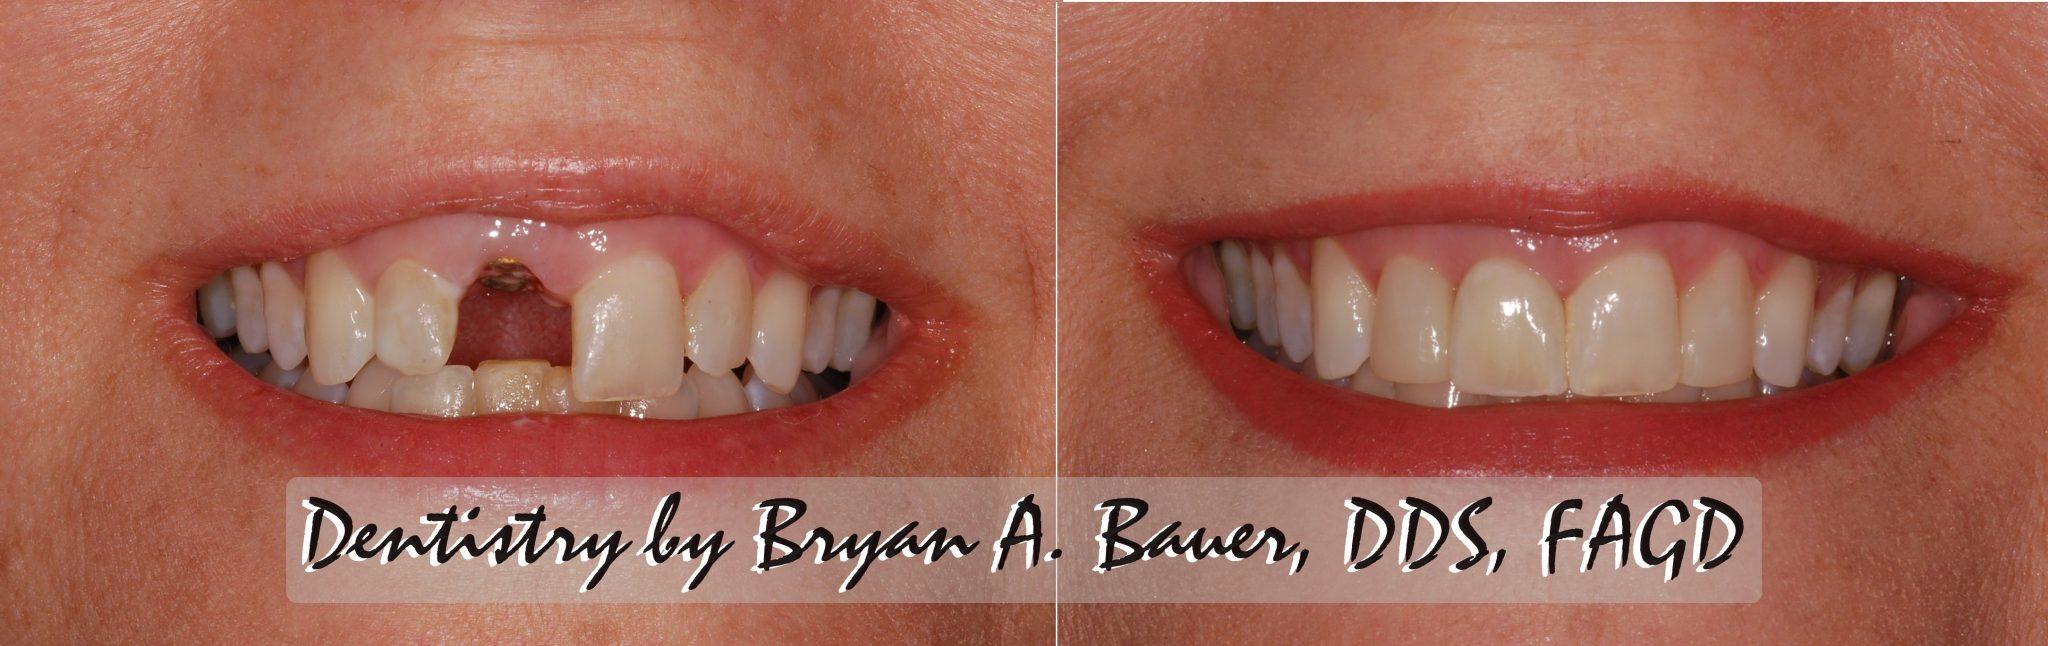 Image of a single immediate dental implant crown